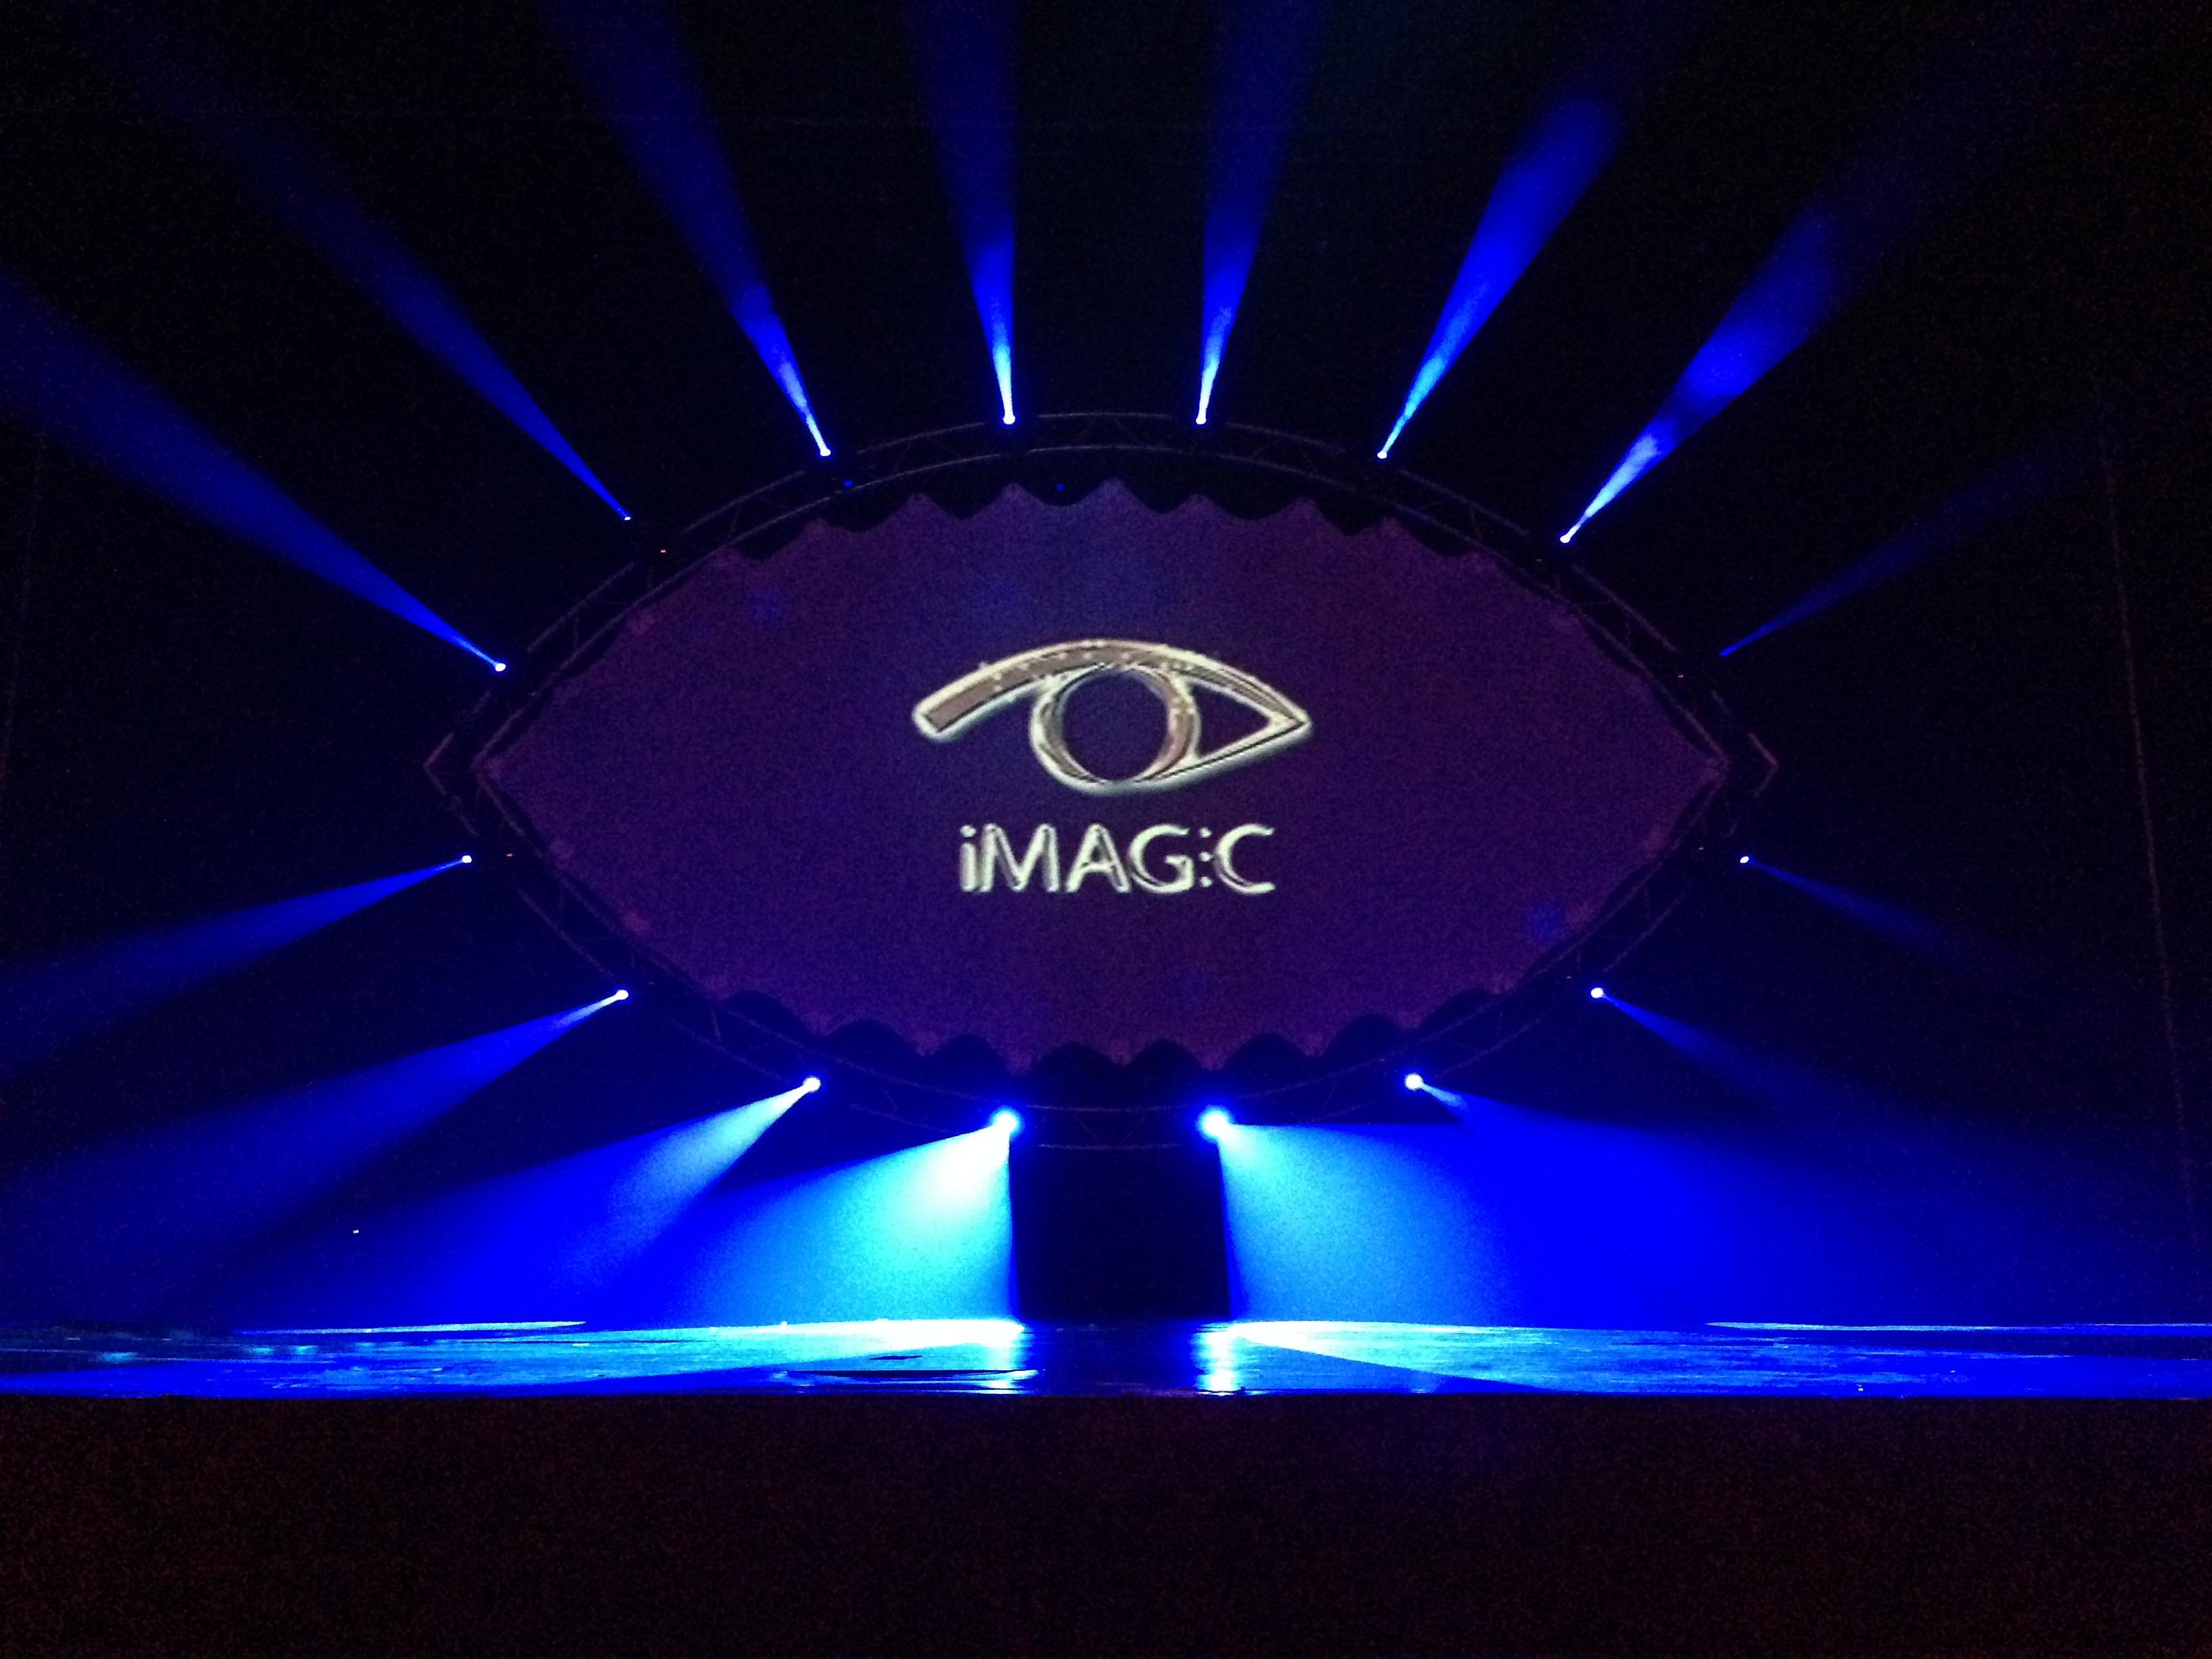 Screen, Imagic, logo